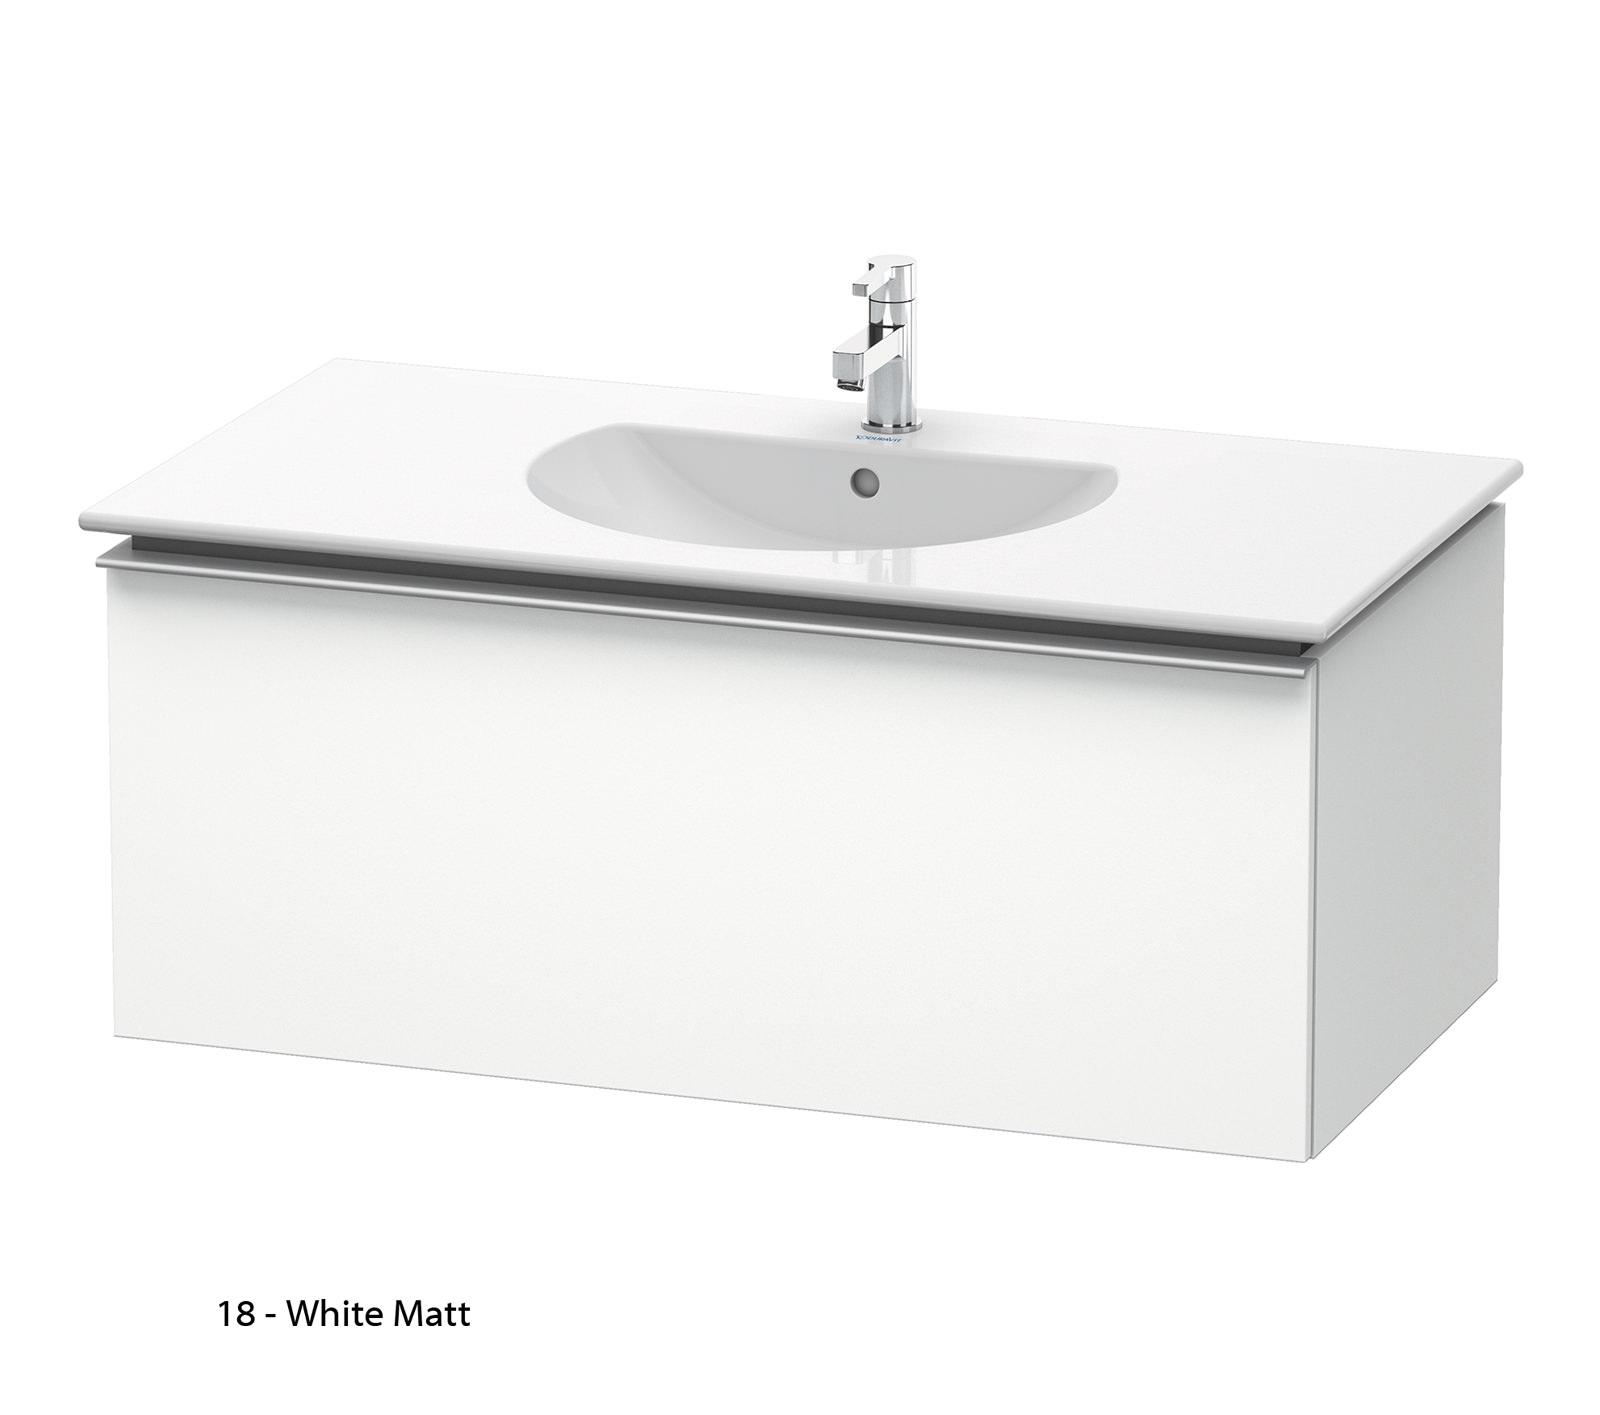 duravit darling new 1000mm wall mounted basin vanity unit dn6462. Black Bedroom Furniture Sets. Home Design Ideas